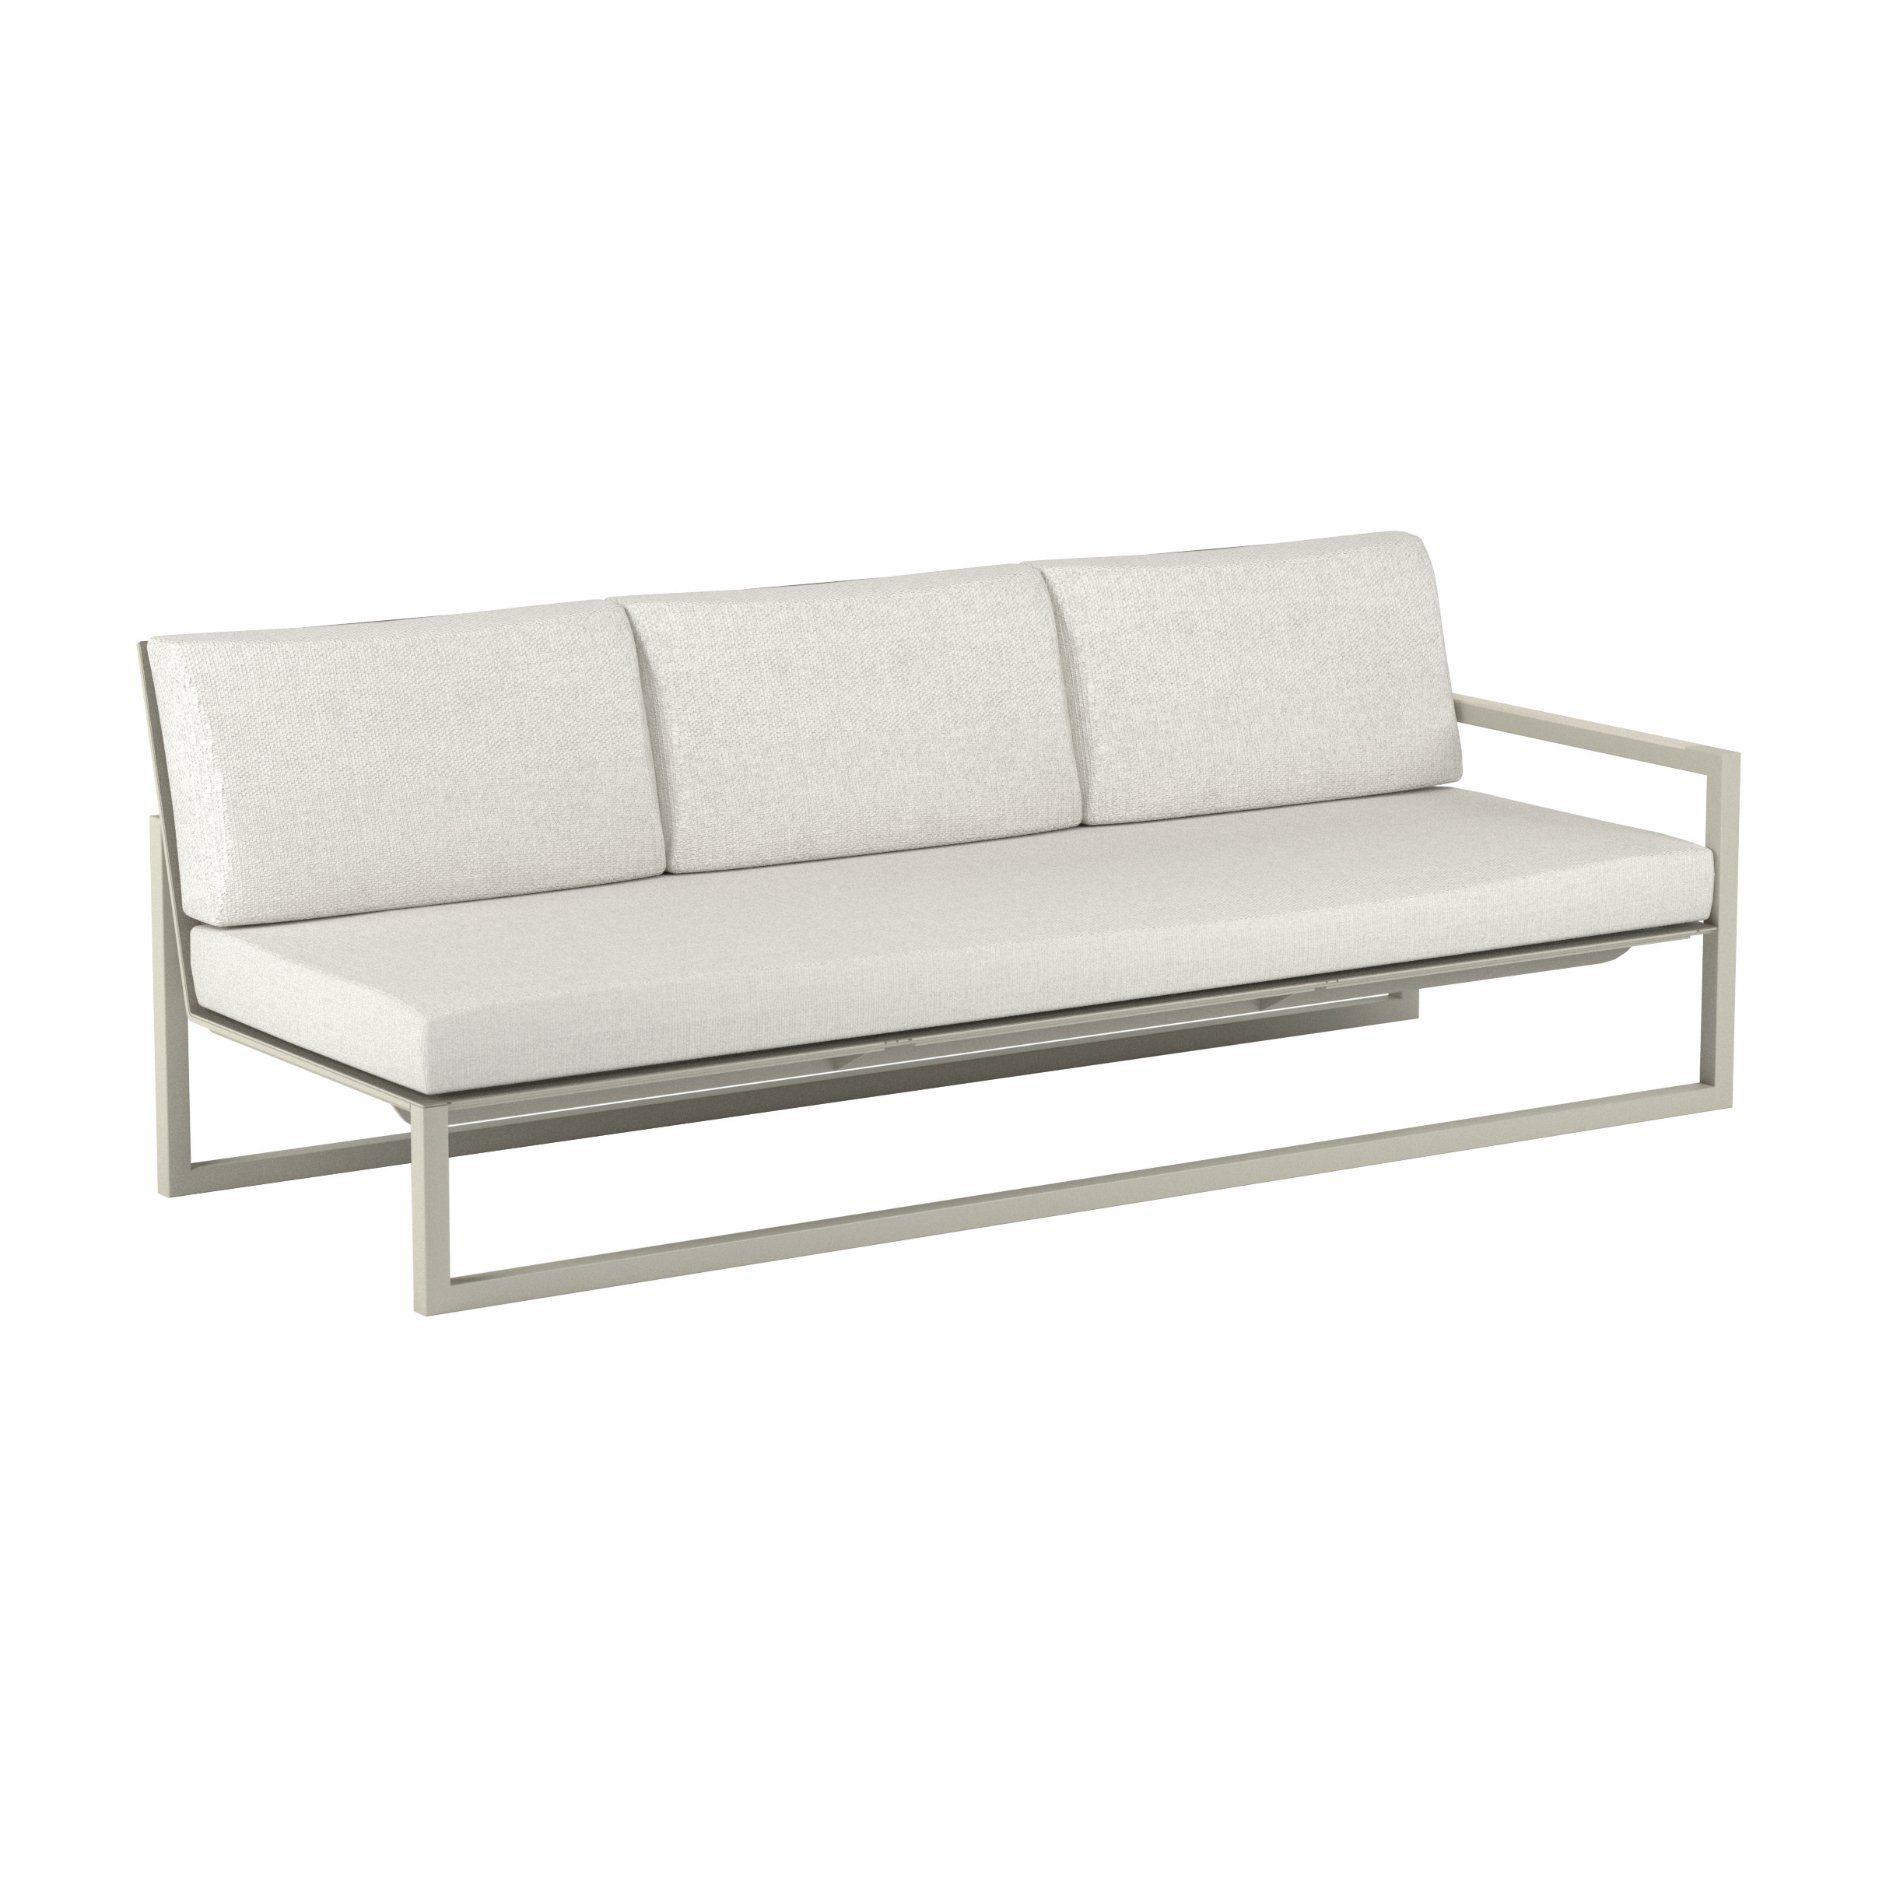 "Royal Botania ""Ninix 240"" 3-Sitzer-Seitenteil links, Gestell Aluminium sand, Bespannung Textilgewebe pearl grey, Kissen Ecru"